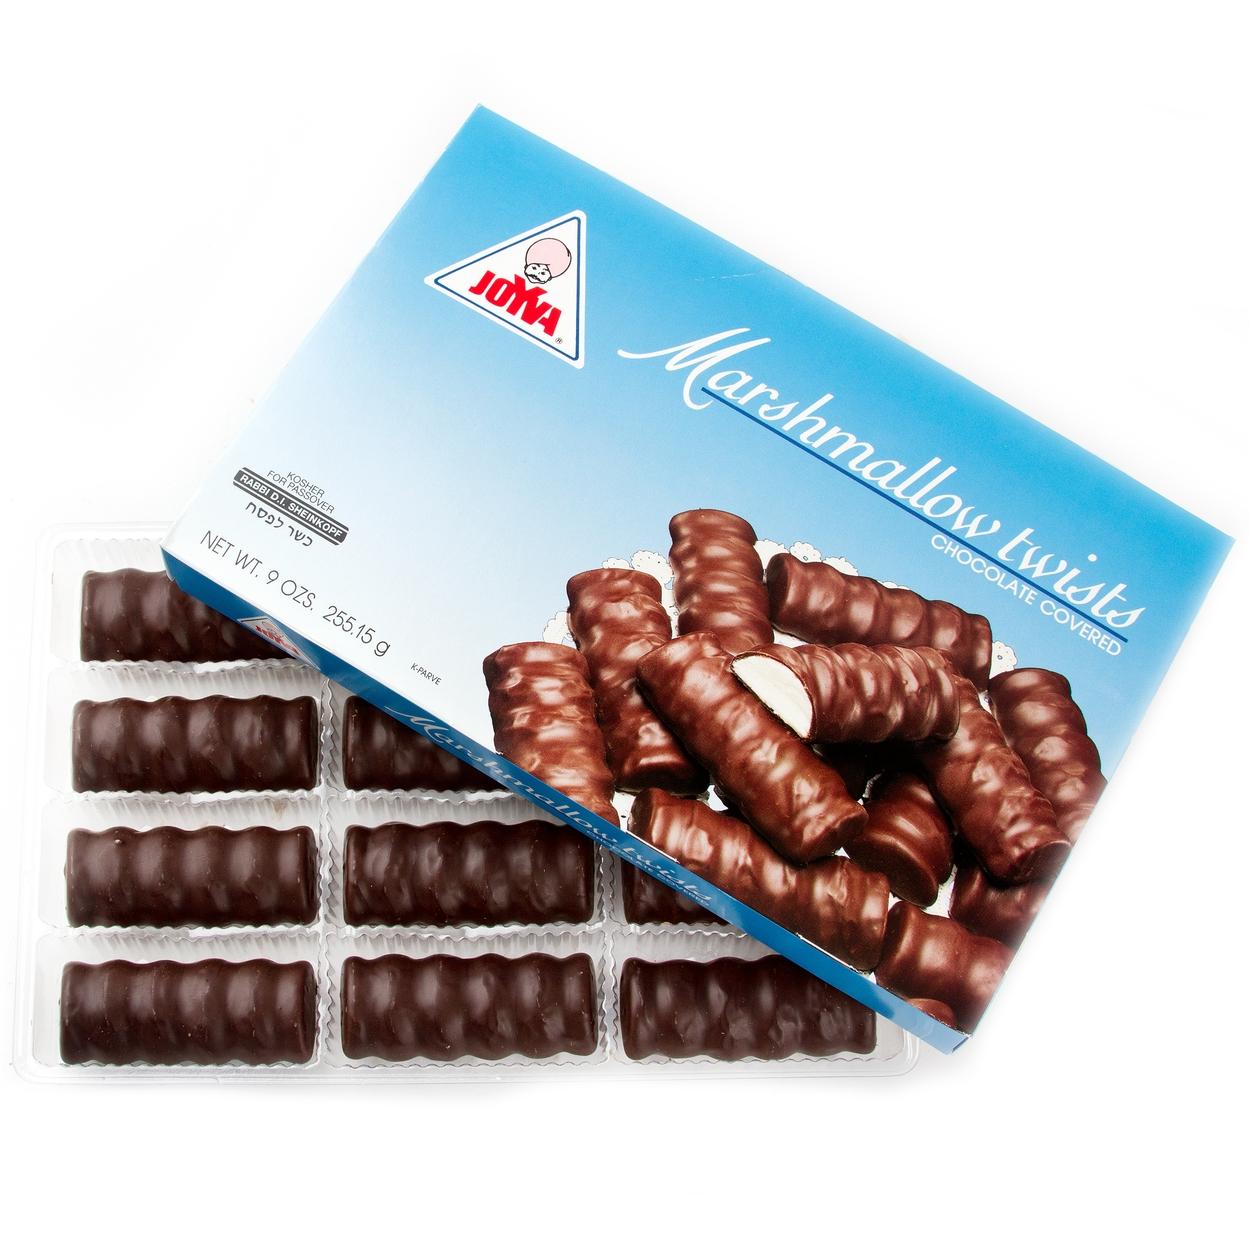 Passover Joyva Chocolate Covered Marshmallow Twists - 9 OZ Box ...